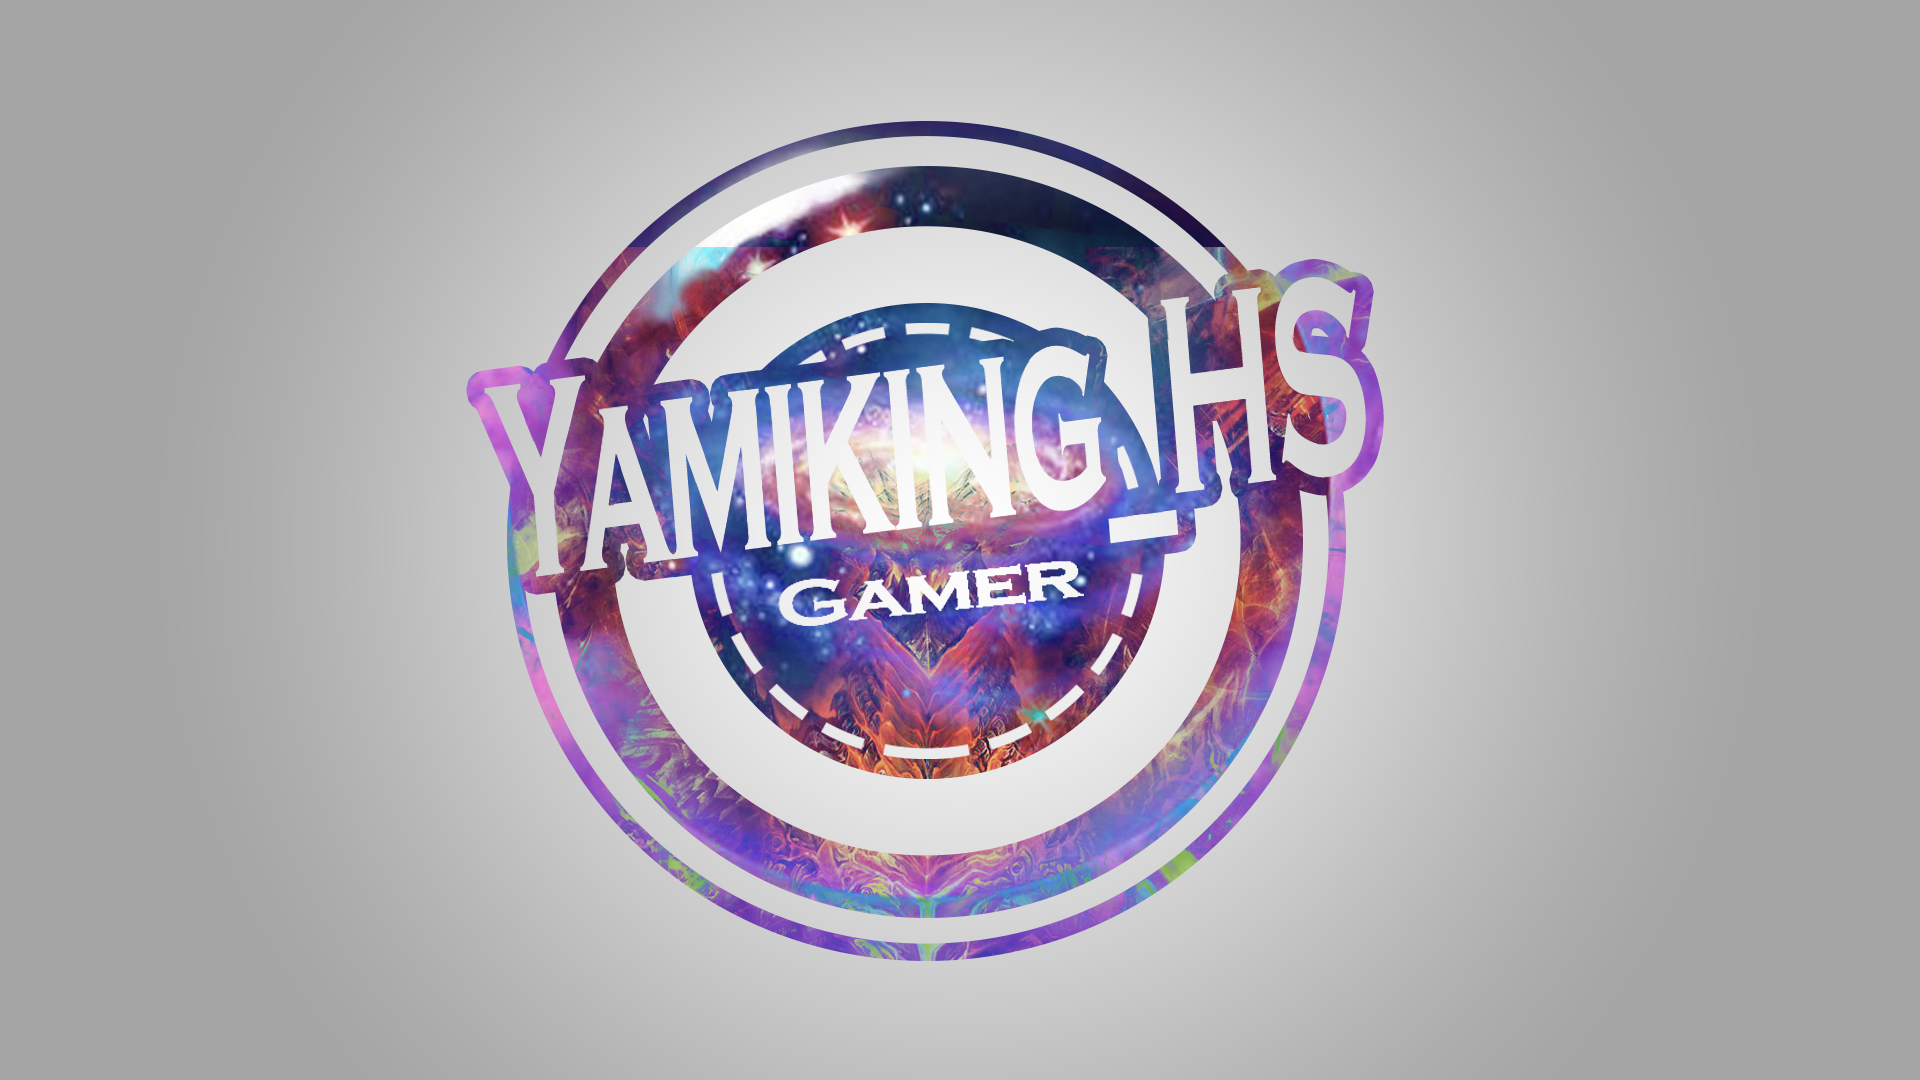 yamiking's Avatar